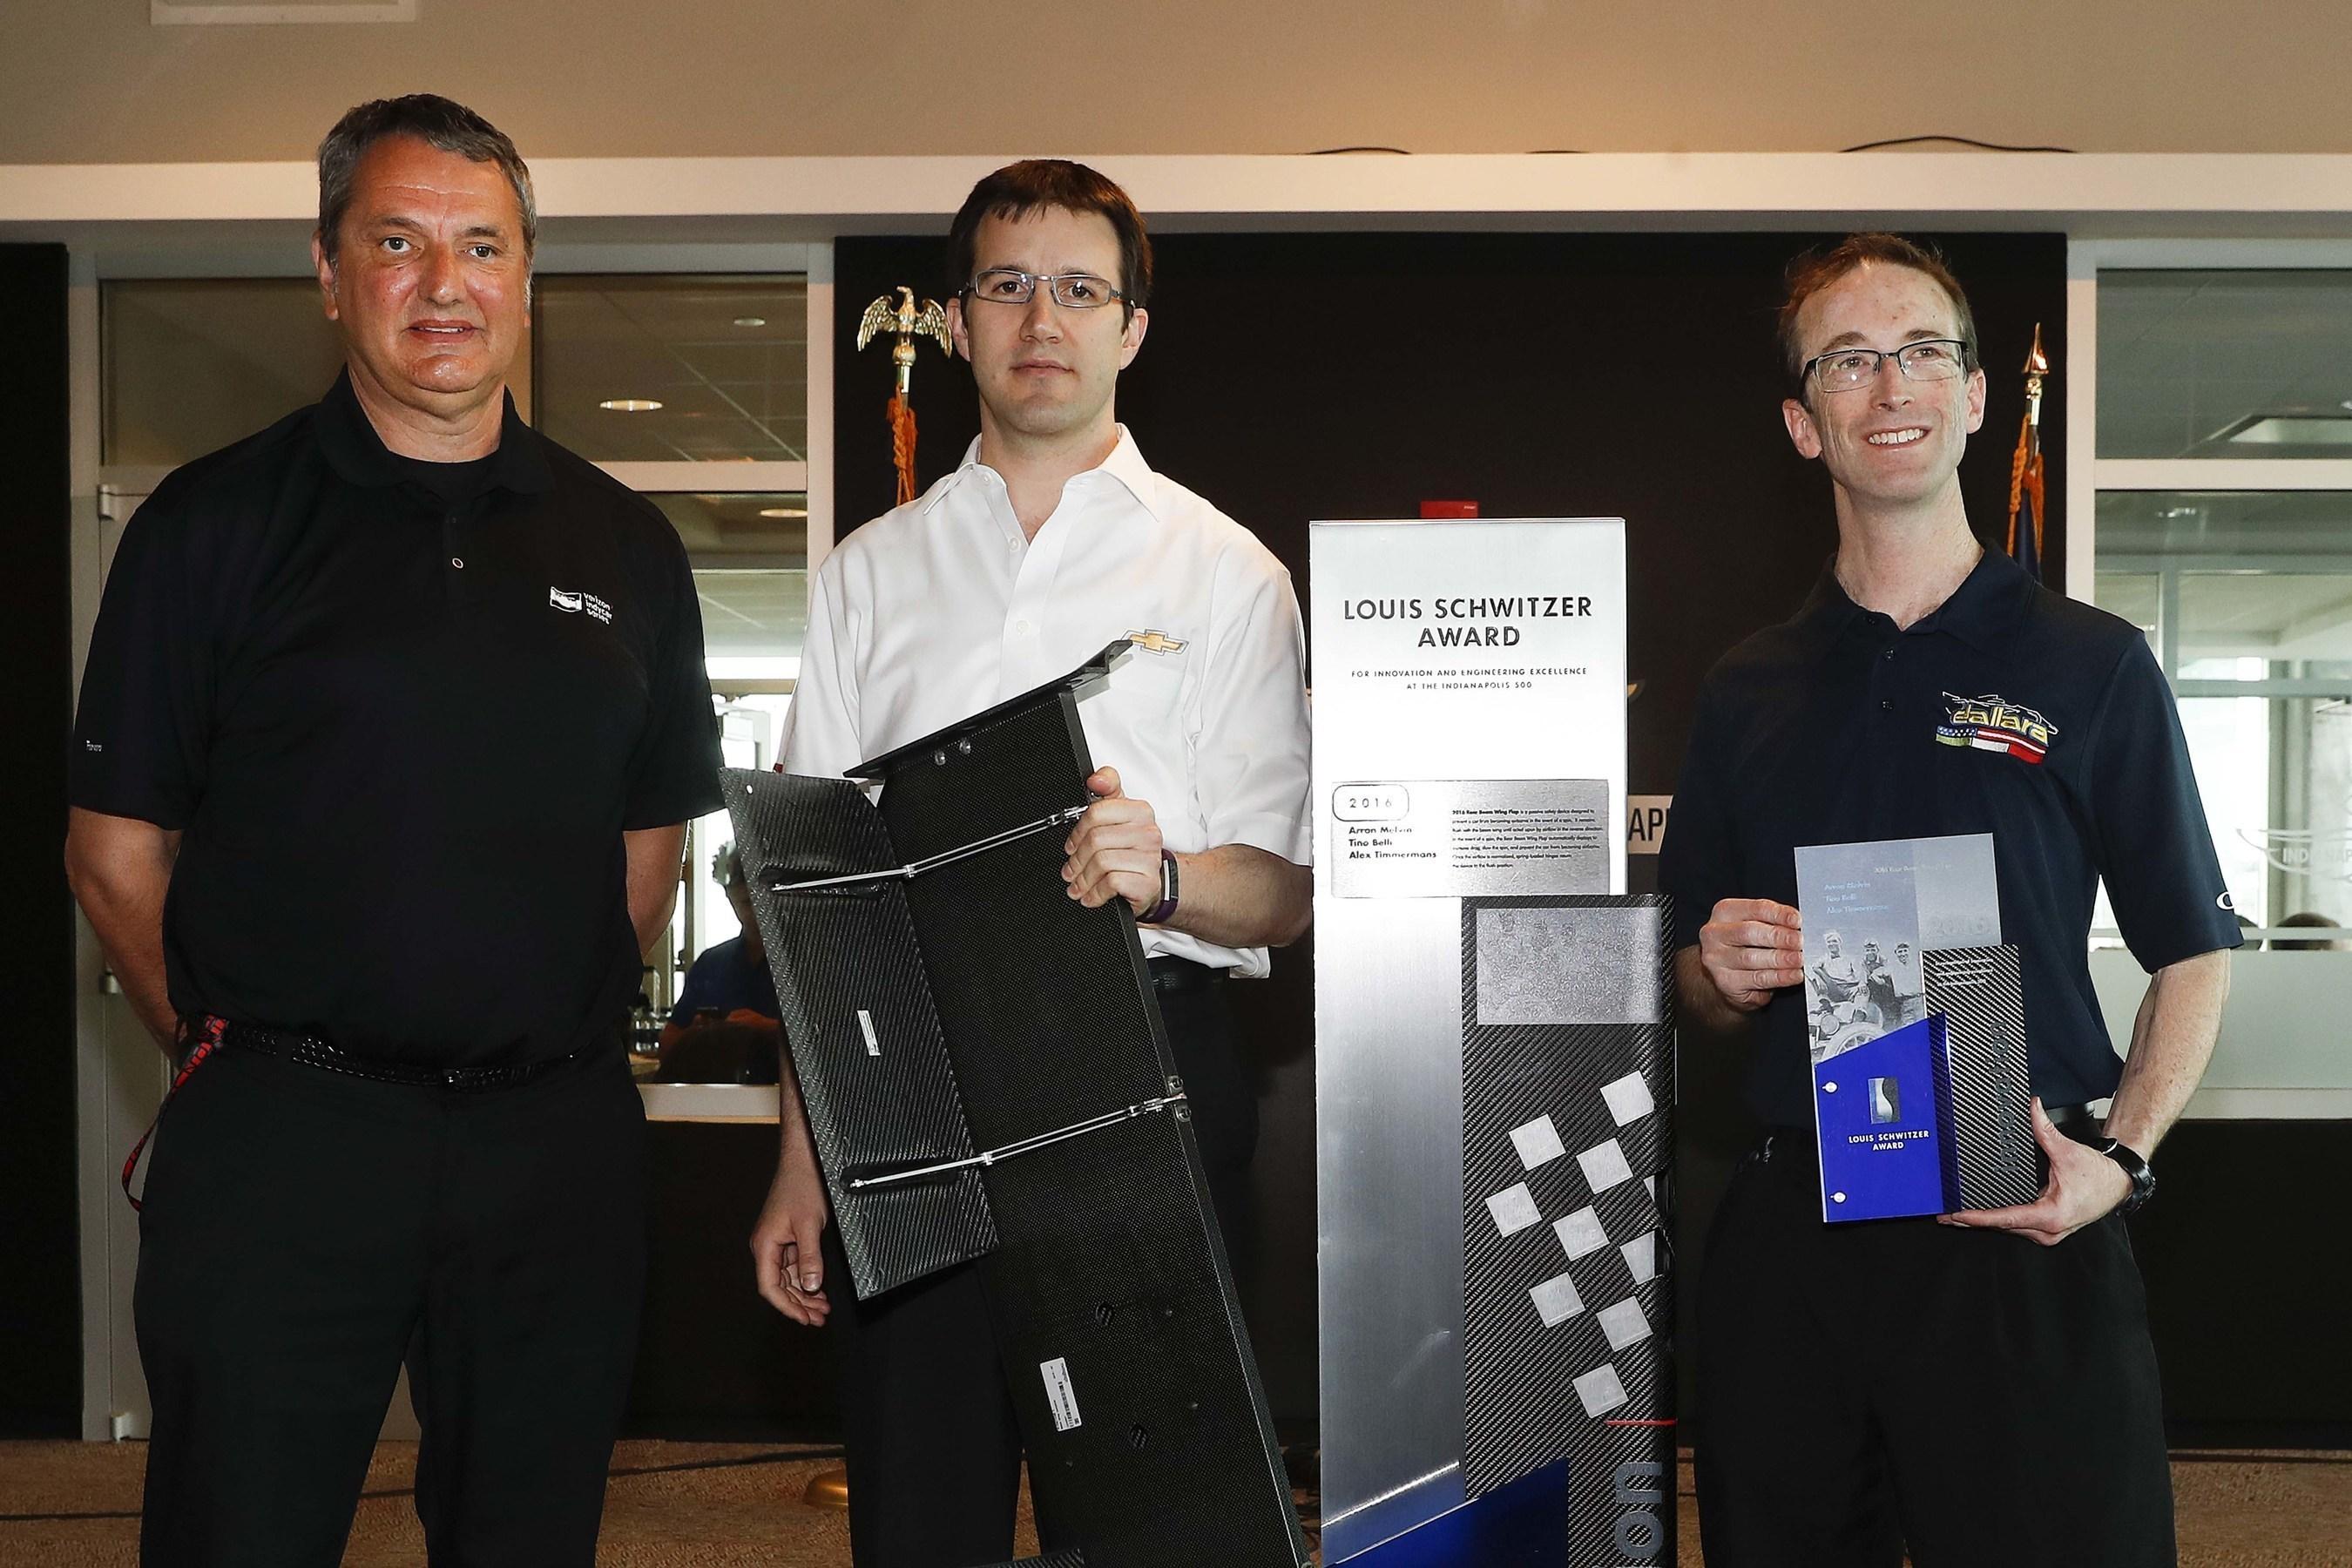 Belli, Melvin And Timmermans Win 2016 Louis Schwitzer Award